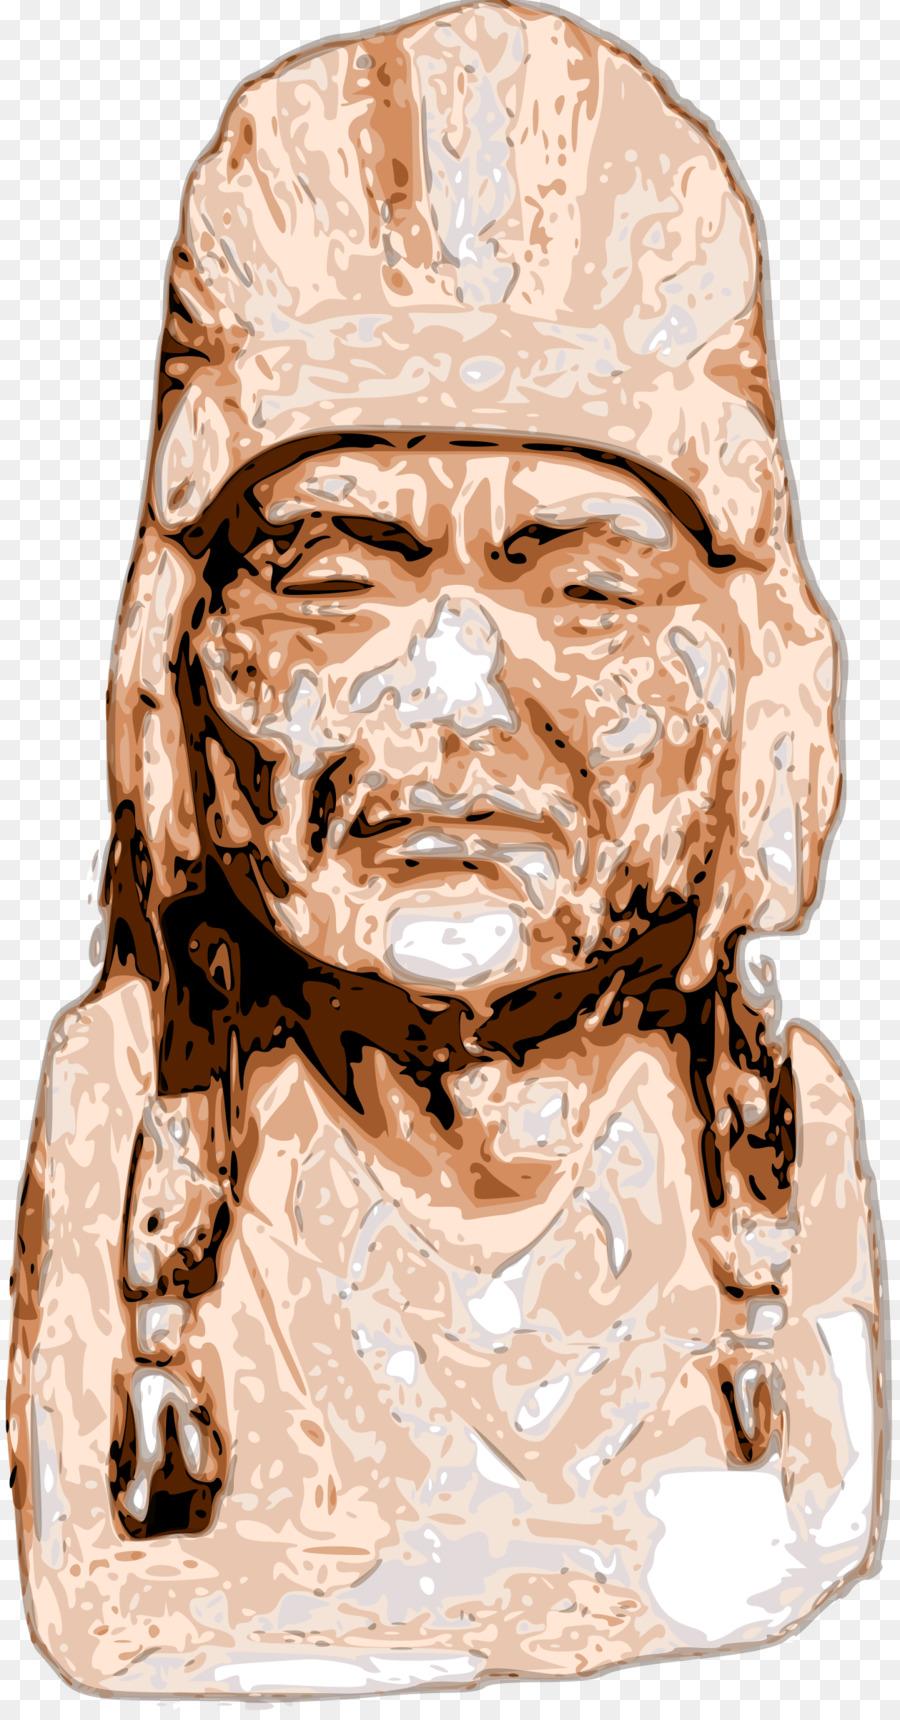 Sculpture clipart Stone sculpture Statue